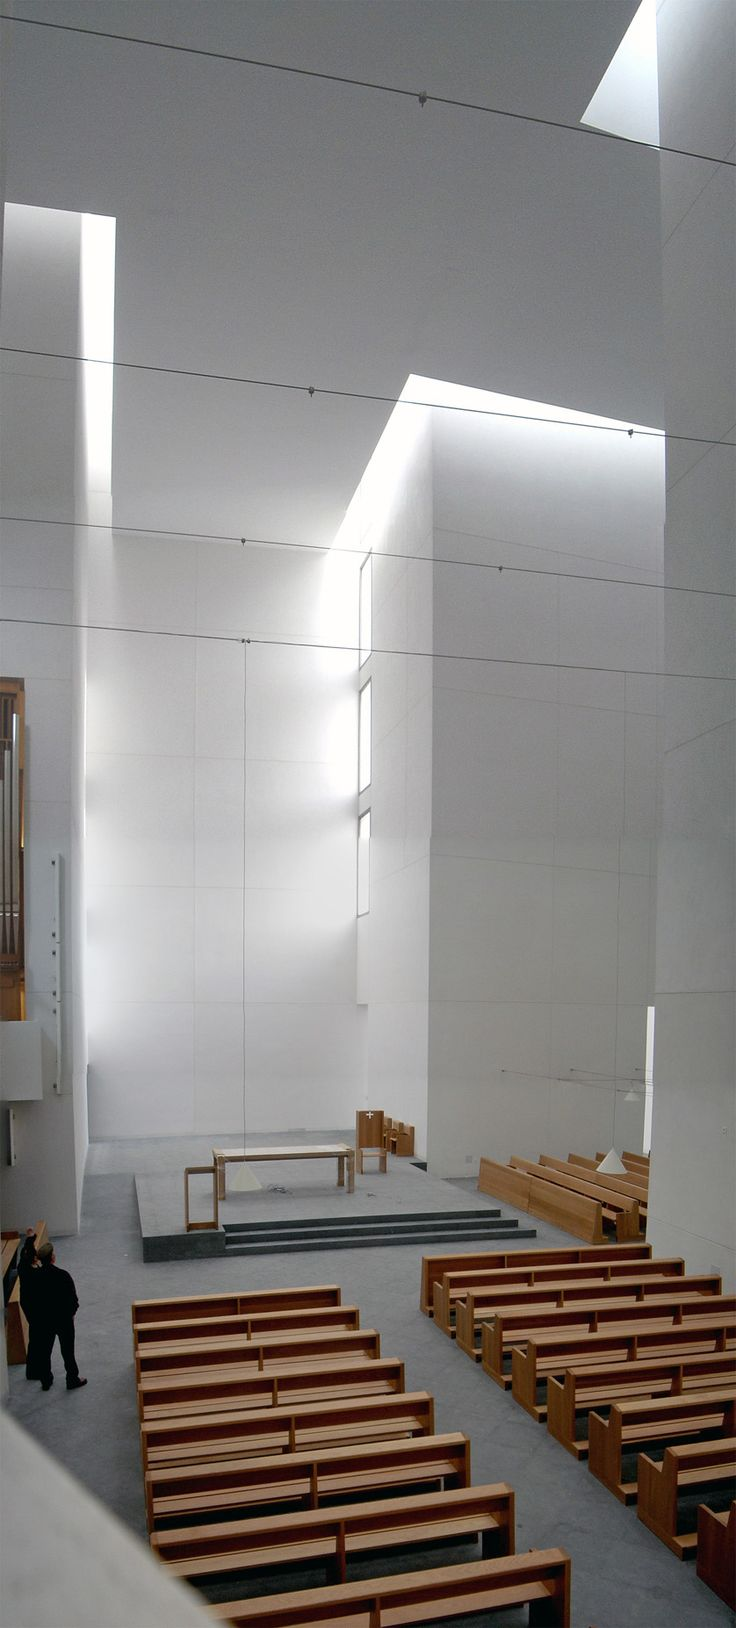 IESU Church by architect Rafael Moneo, Riberas de Loiola, San Sebastian, Gipuzkoa, Euskal Herria.